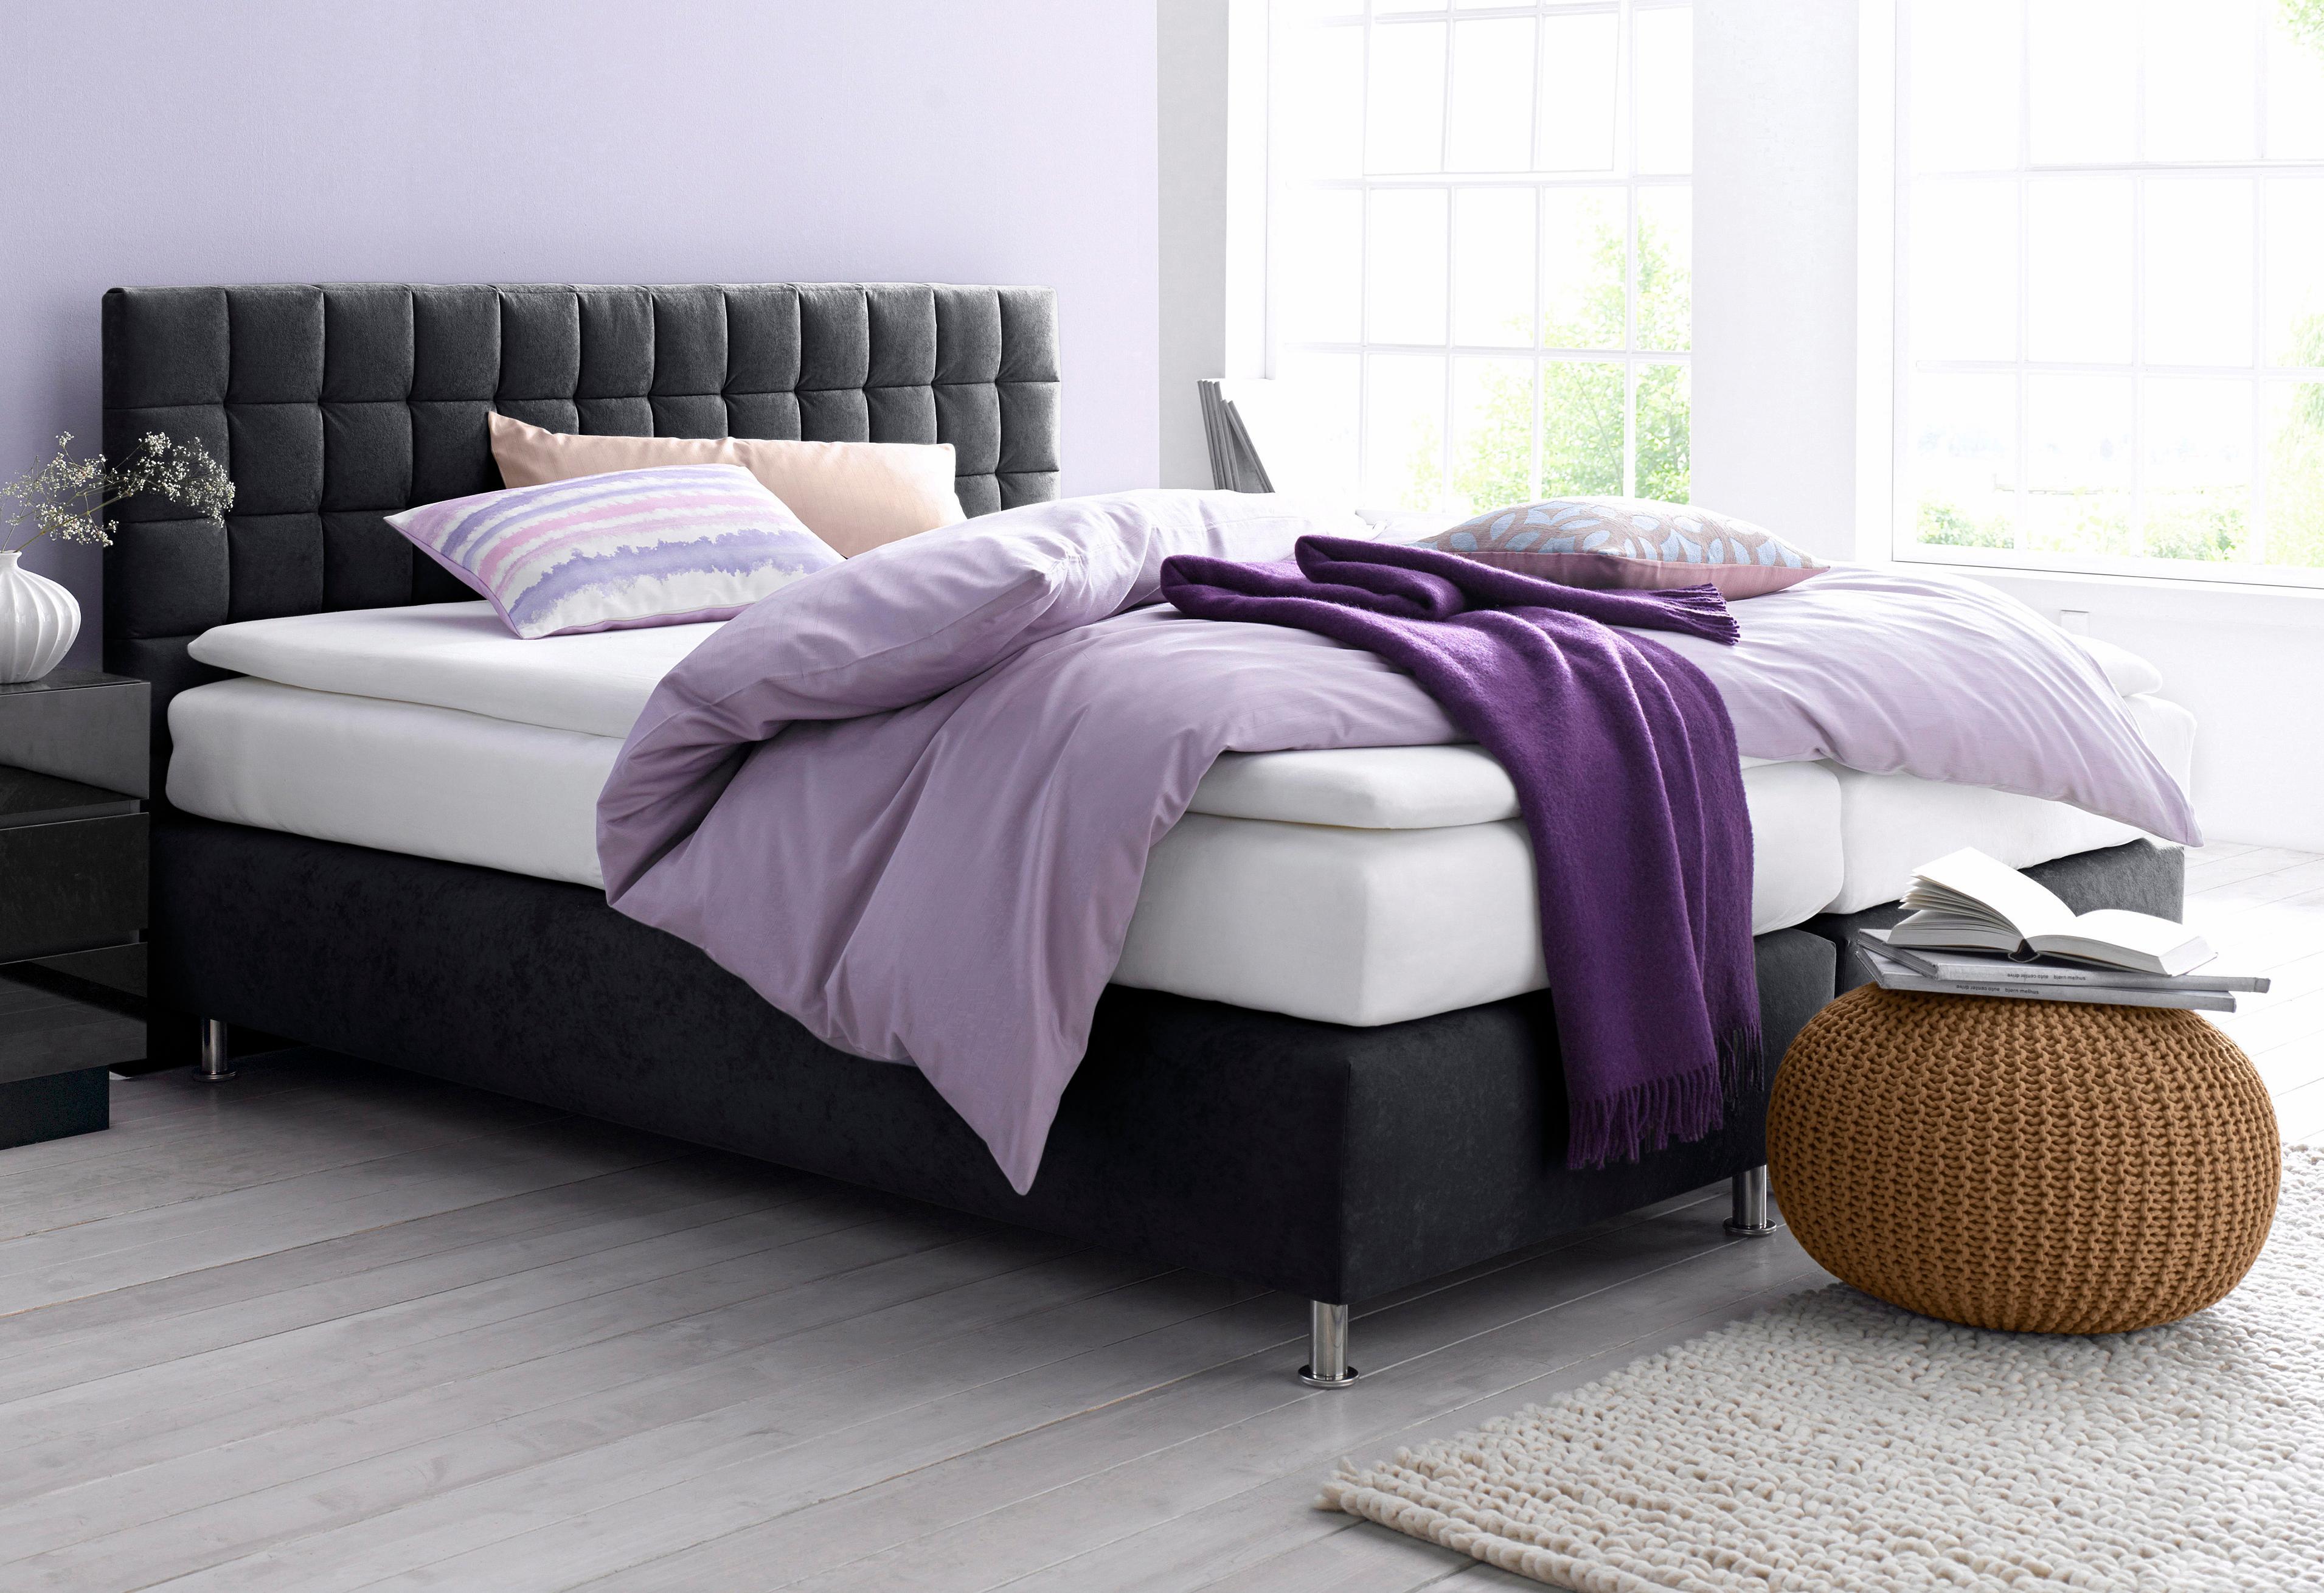 Westfalia Schlafkomfort Boxspringbett   Schlafzimmer > Betten > Boxspringbetten   Strukturstoff - Polyester   WESTFALIA SCHLAFKOMFORT